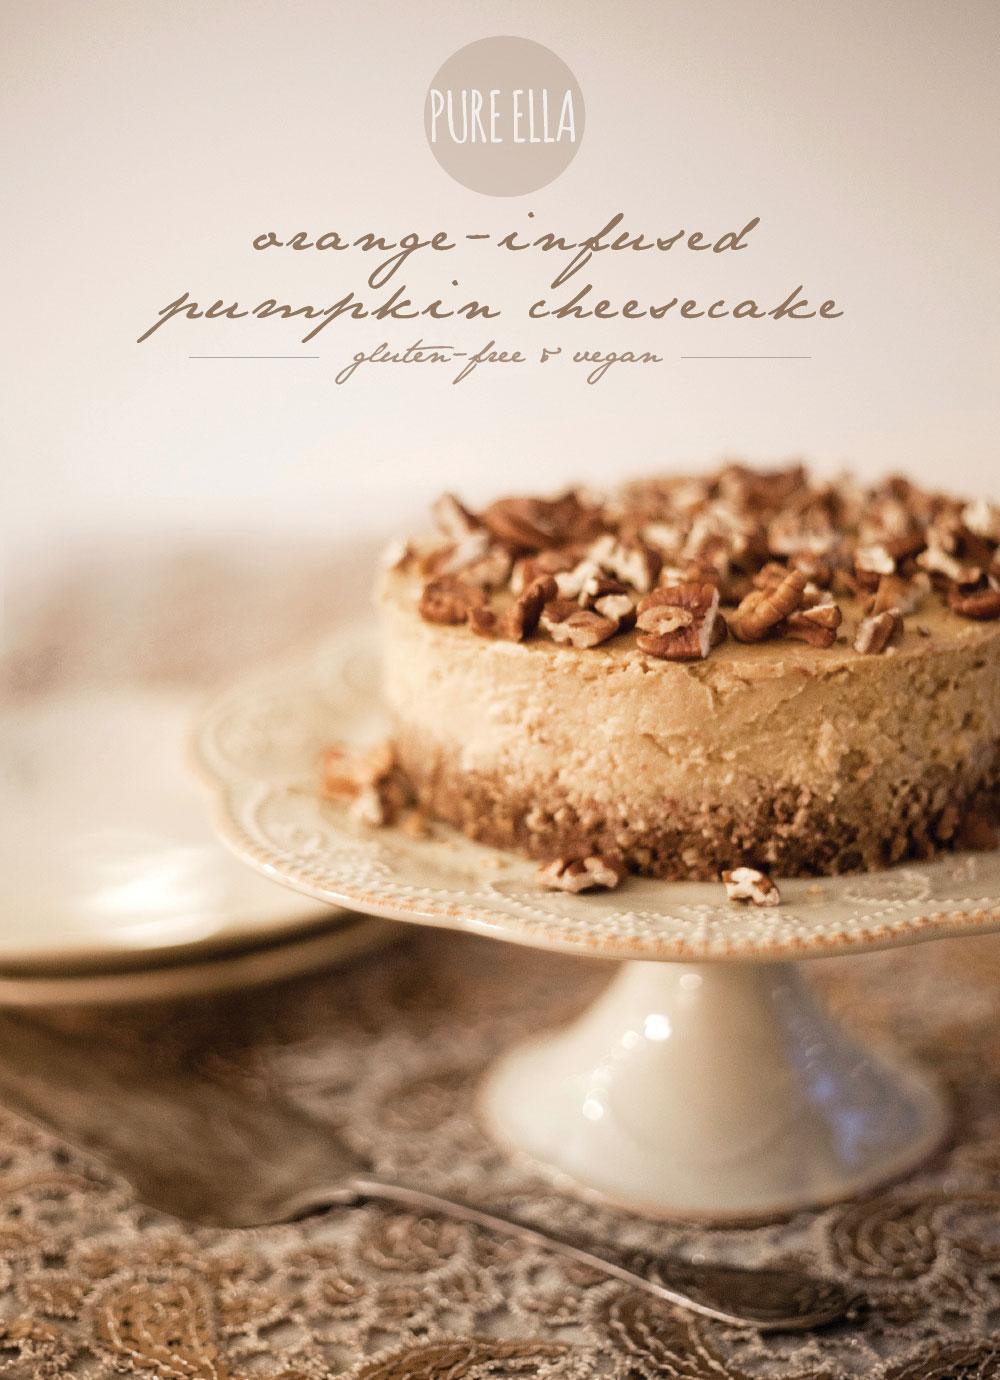 Pure-Ella-gluten-free-vegan-orange-infused-pumpkin-cheesecake